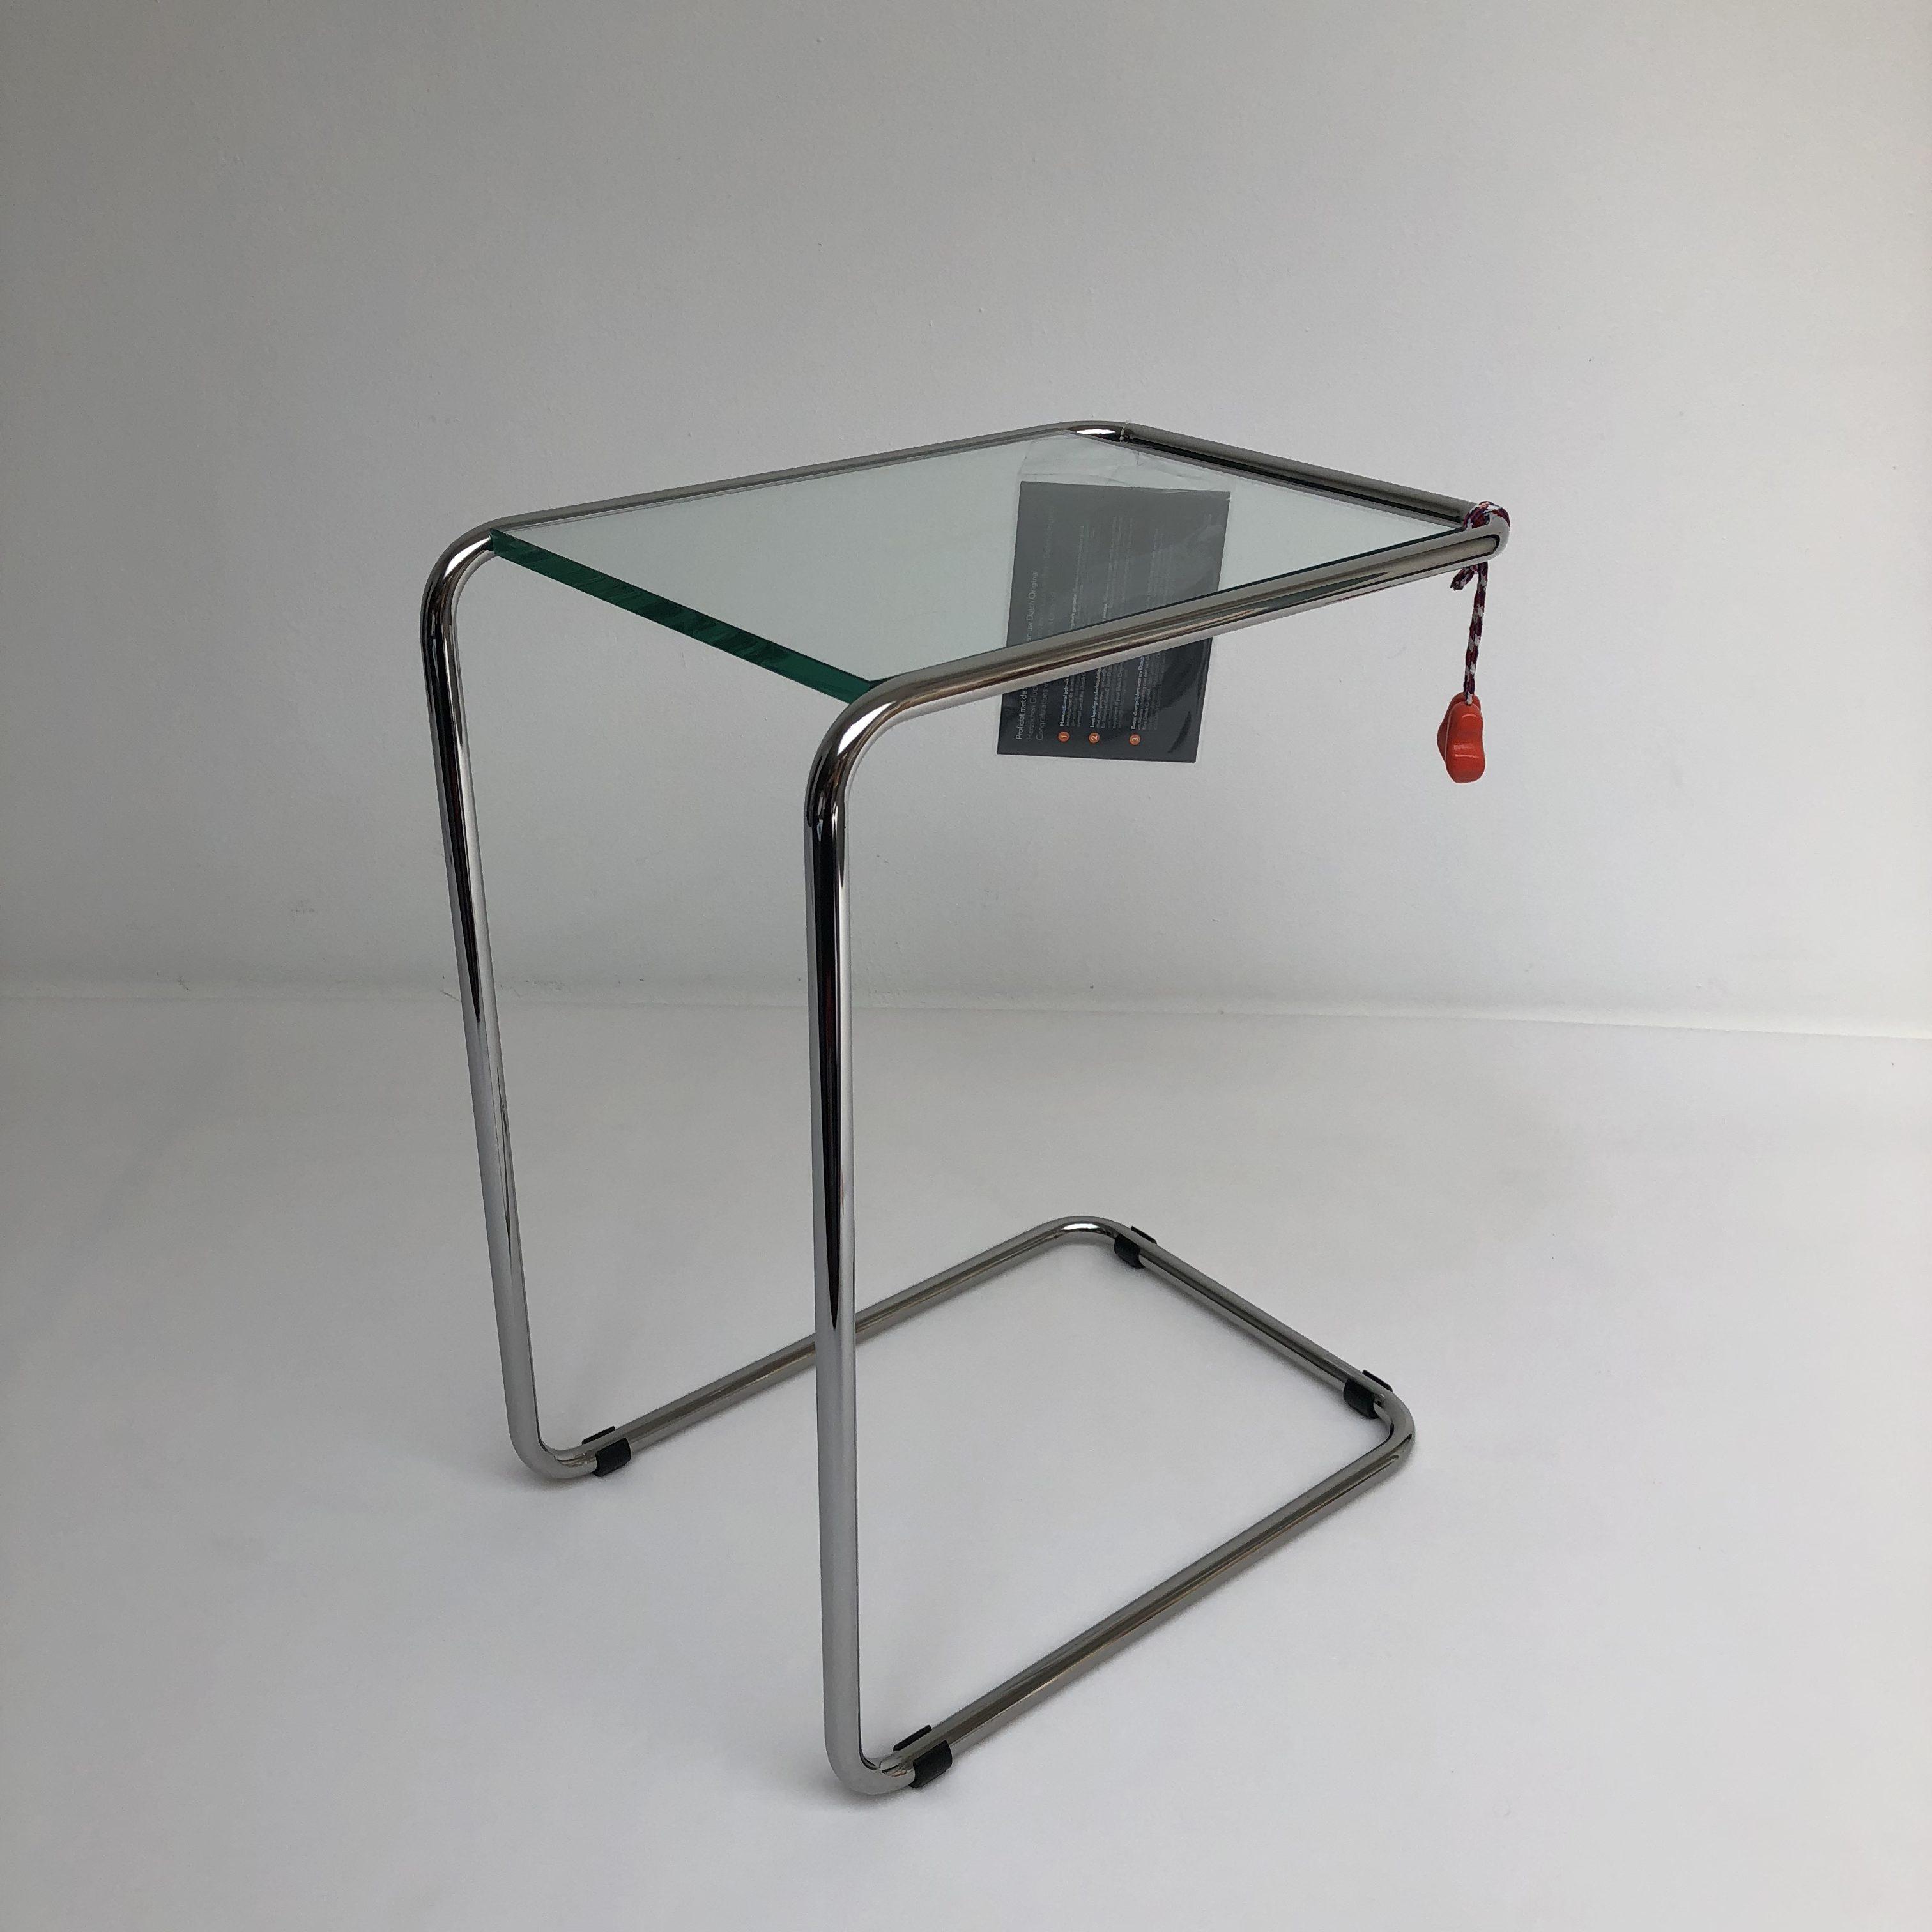 Bijzettafel Gispen Glas.Gispen Today 530 Bijzettafel In Chroom En Glas